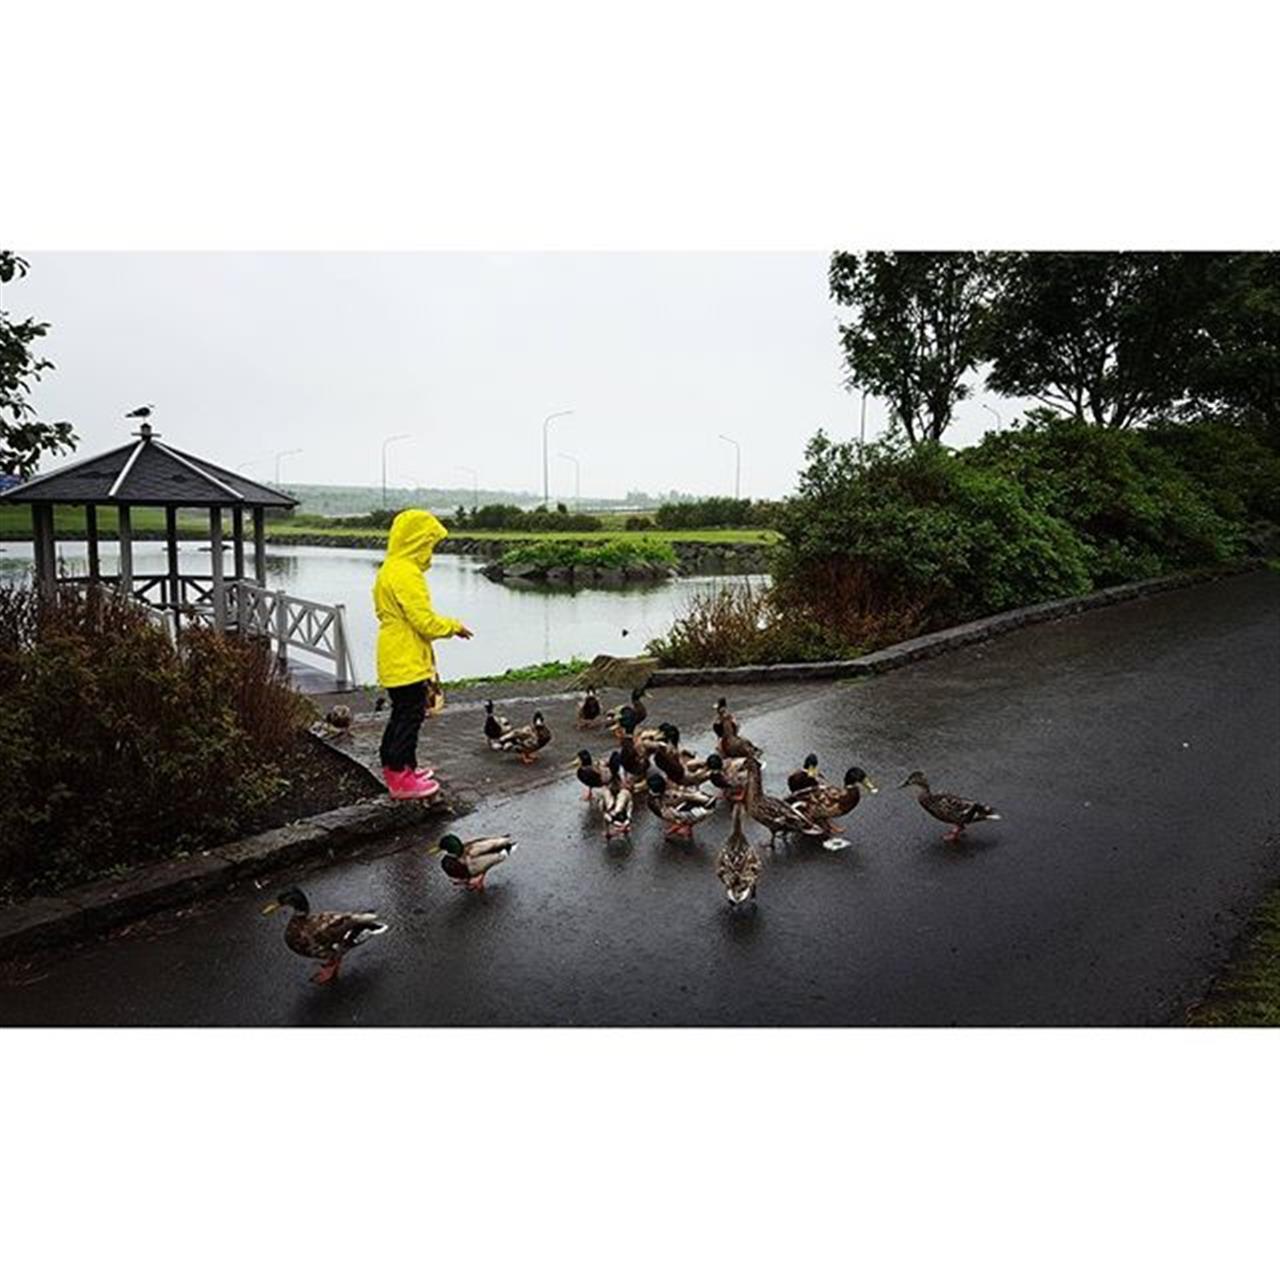 Skruppum niur ß K¾pavogstj÷rn. Gµsirnar voru ¾venju spakar. Feeding the birds, could almost pet them. #k¾pavogur #k¾pavogstj÷rn #pond #fuglar #fugl #fuglalif #birds #nature #nattura #living #fun #leadingrelocal #leadingre